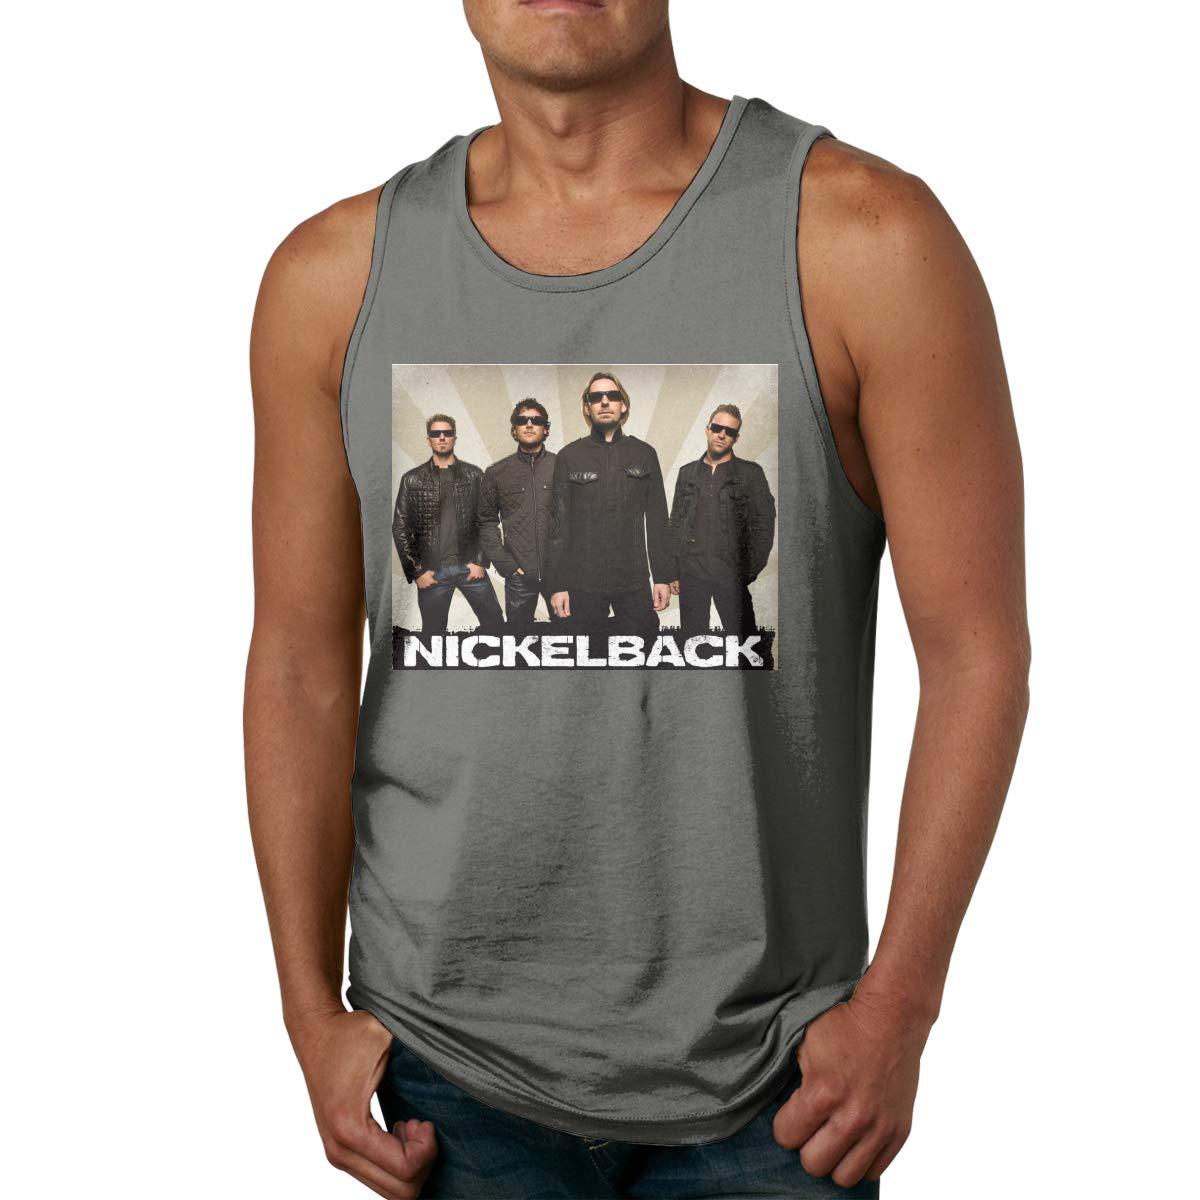 Sport Gym Tank Tops Nickelback Sleeveless T Shirts